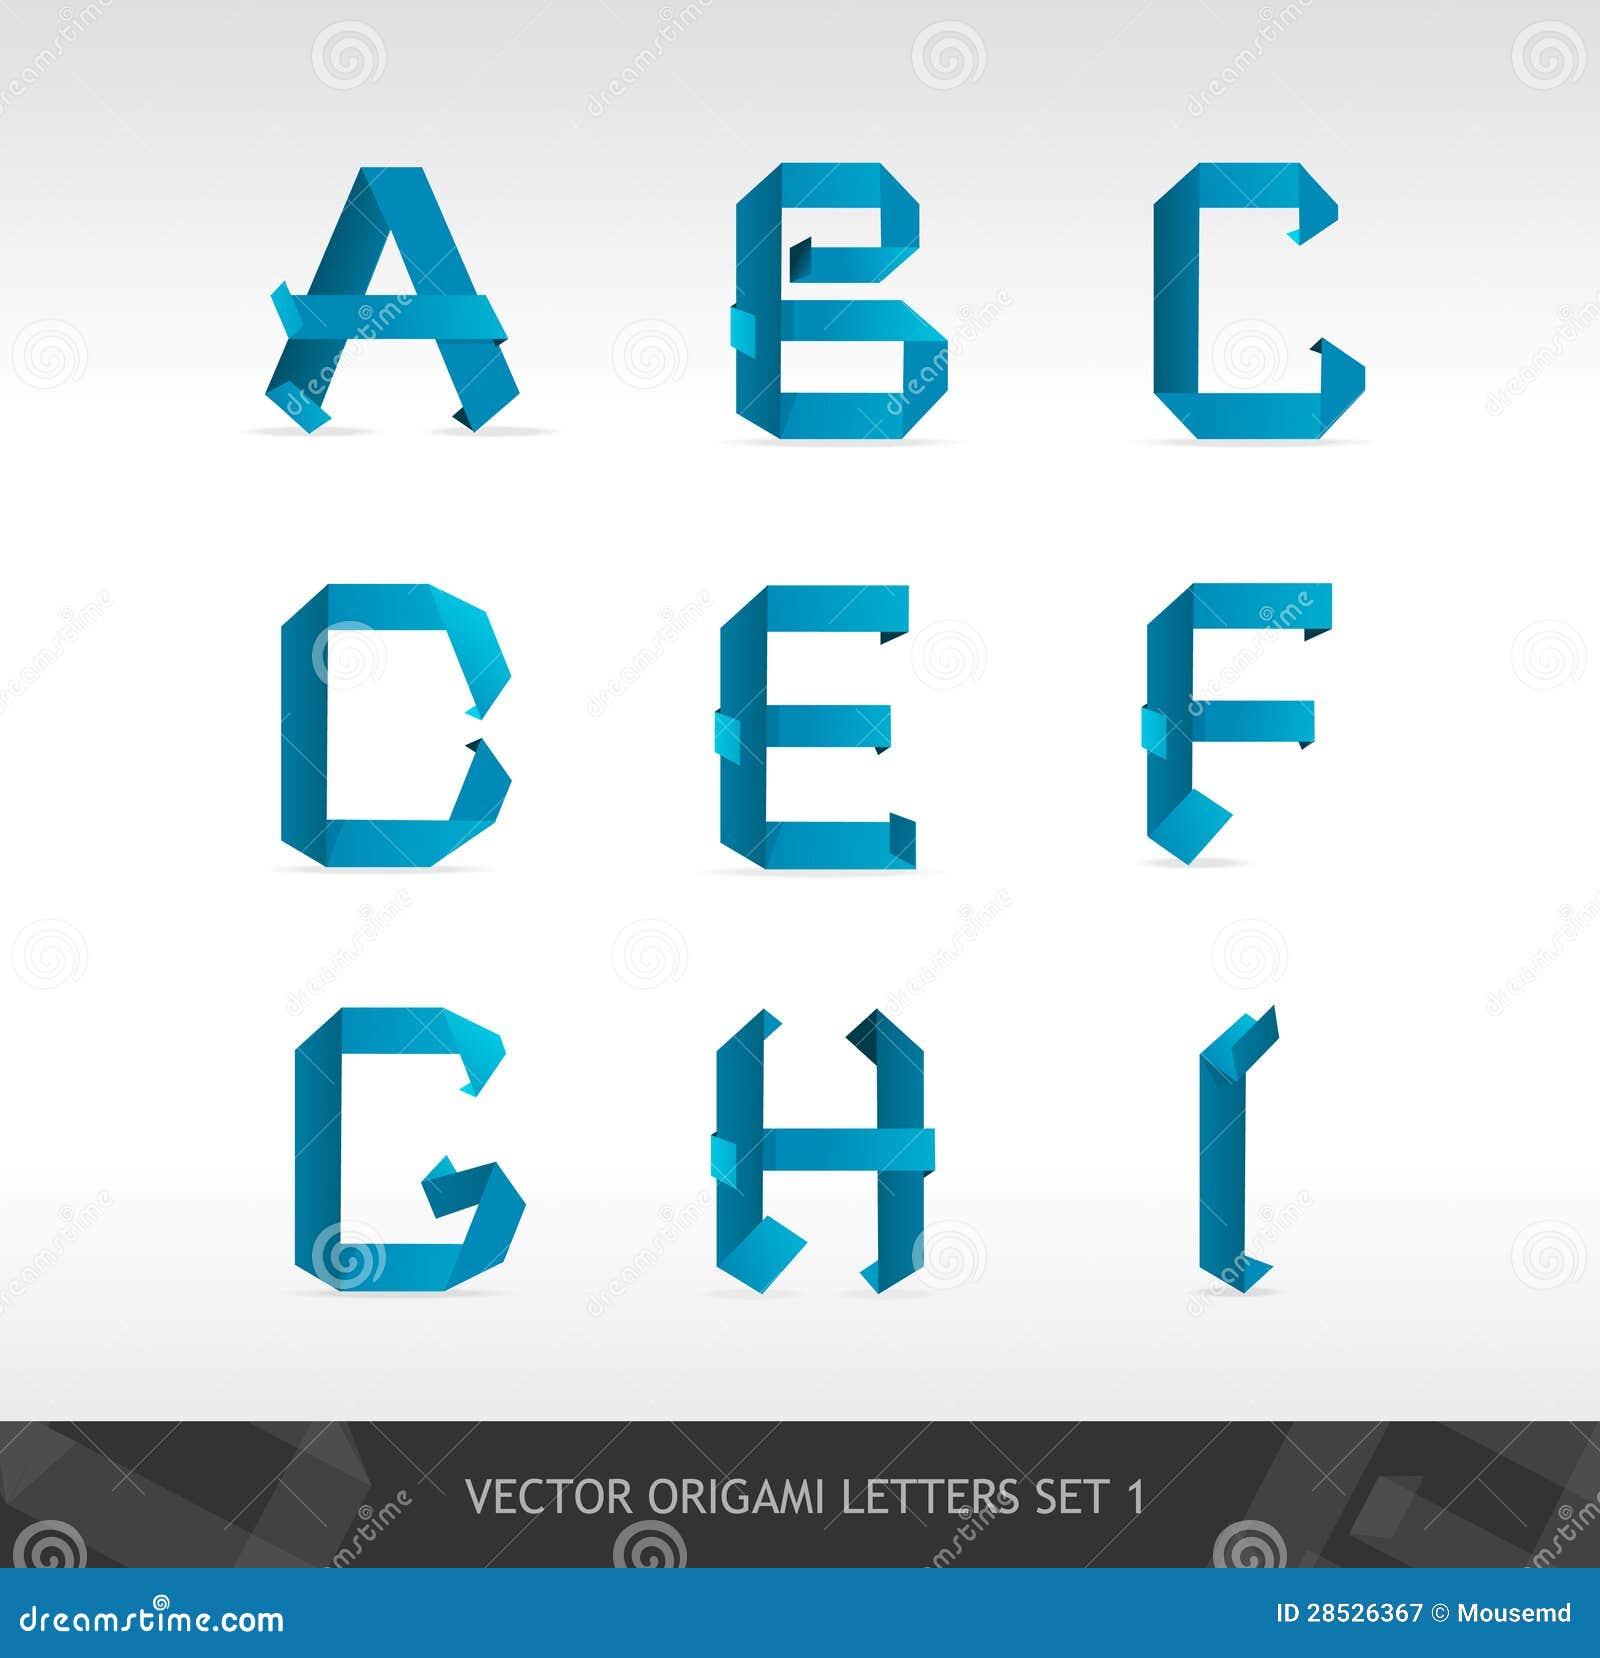 El papel pone letras a origami ilustracin del vector el papel pone letras a origami diseo alfabeto jeuxipadfo Choice Image